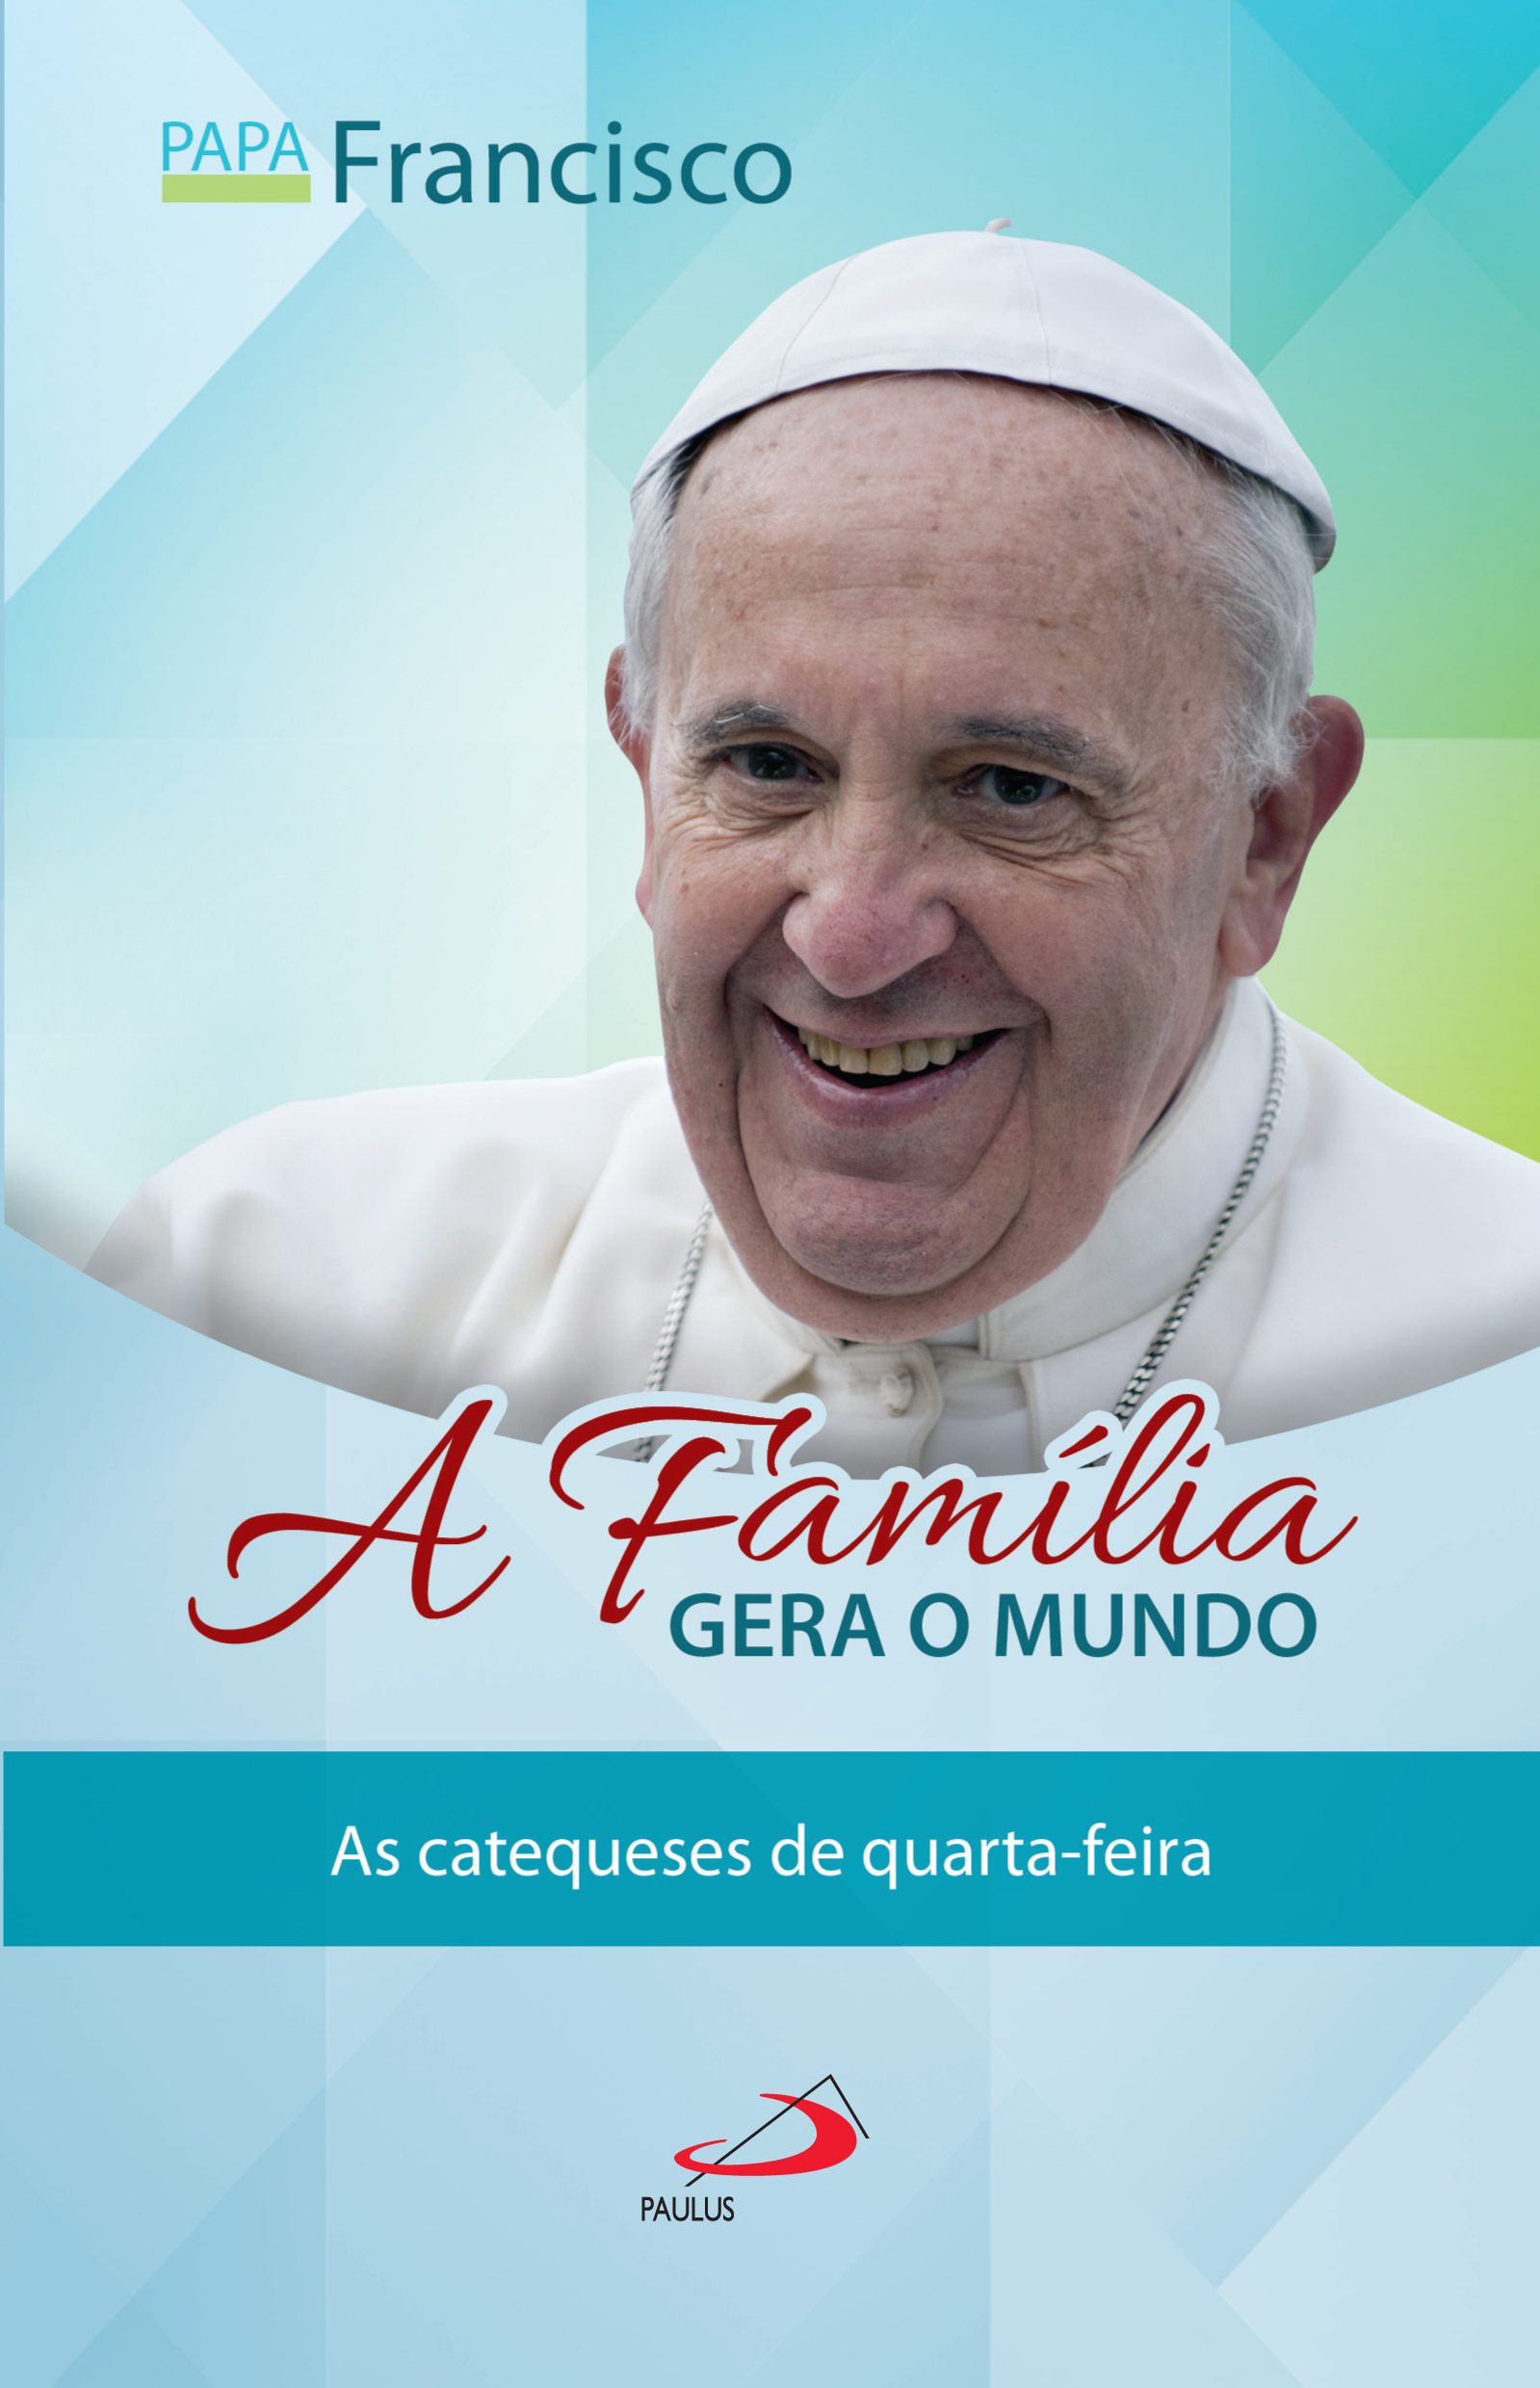 PAULUS lança obra do Papa Francisco « Paulus Editora #079BB5 1599 2479